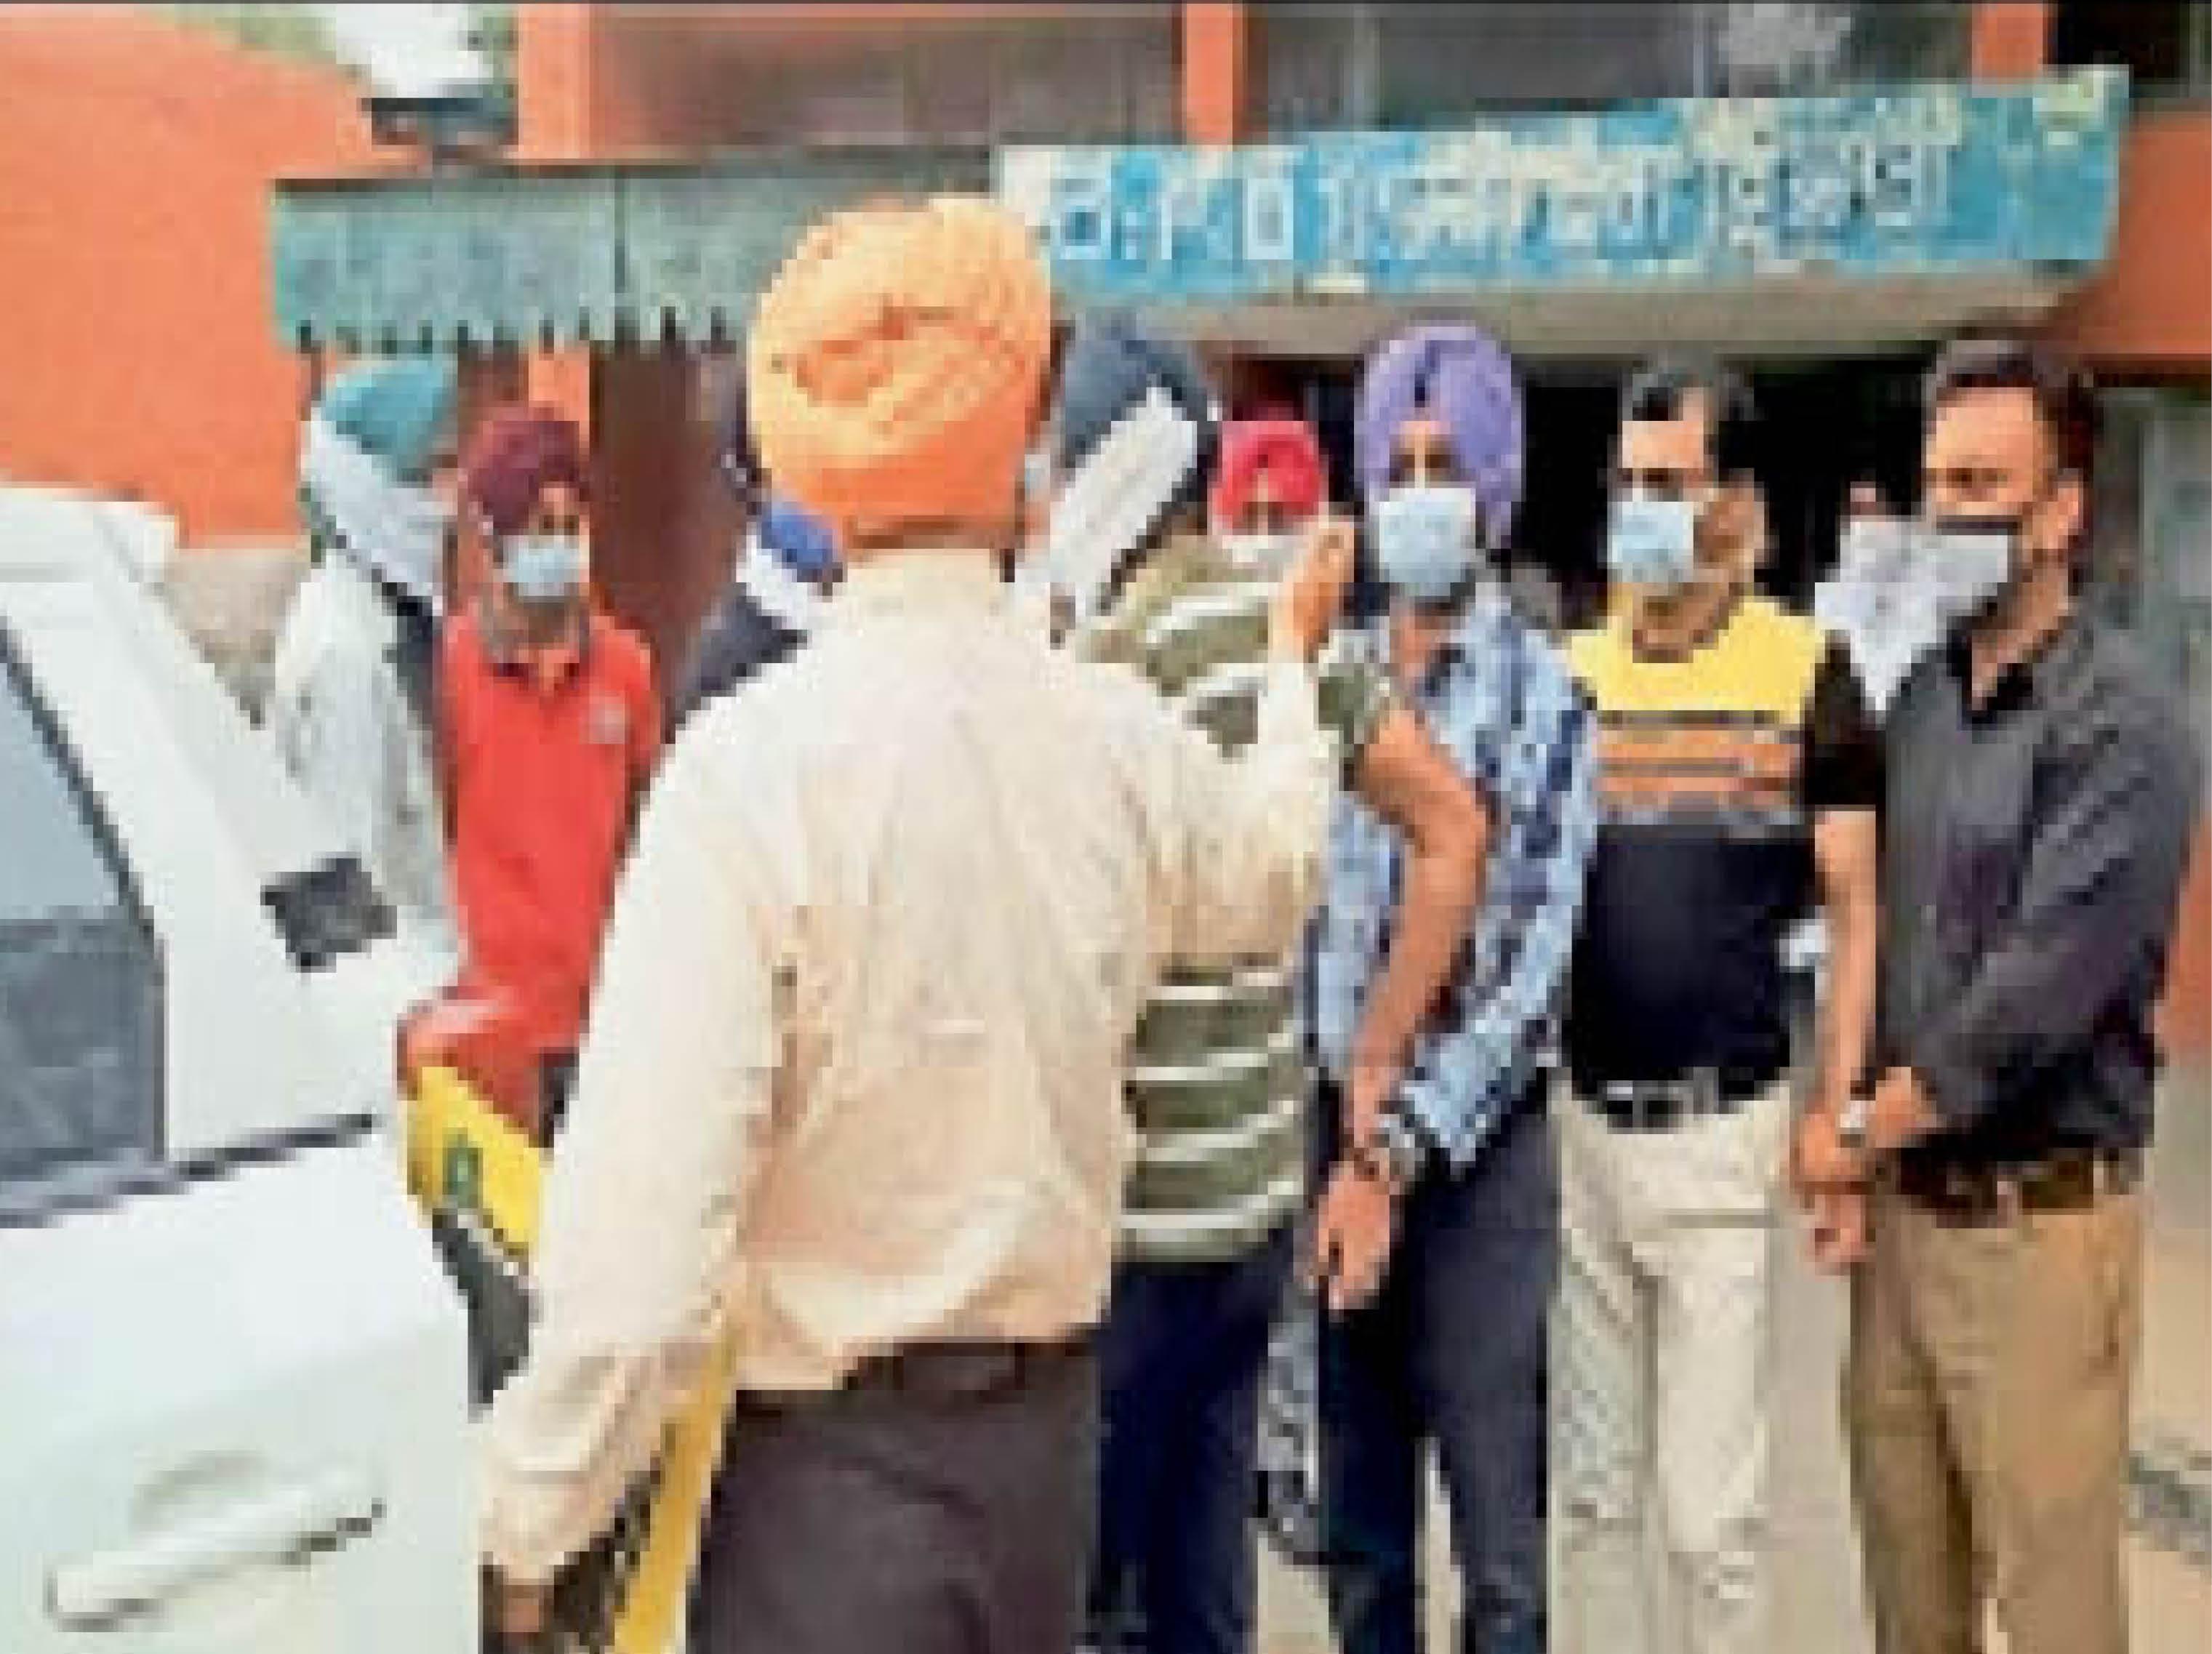 एमएलआर काटने पर 40 हजार रुपए रिश्वत लेते दो फार्मासिस्ट व डॉक्टर अरेस्ट|अमृतसर,Amritsar - Dainik Bhaskar